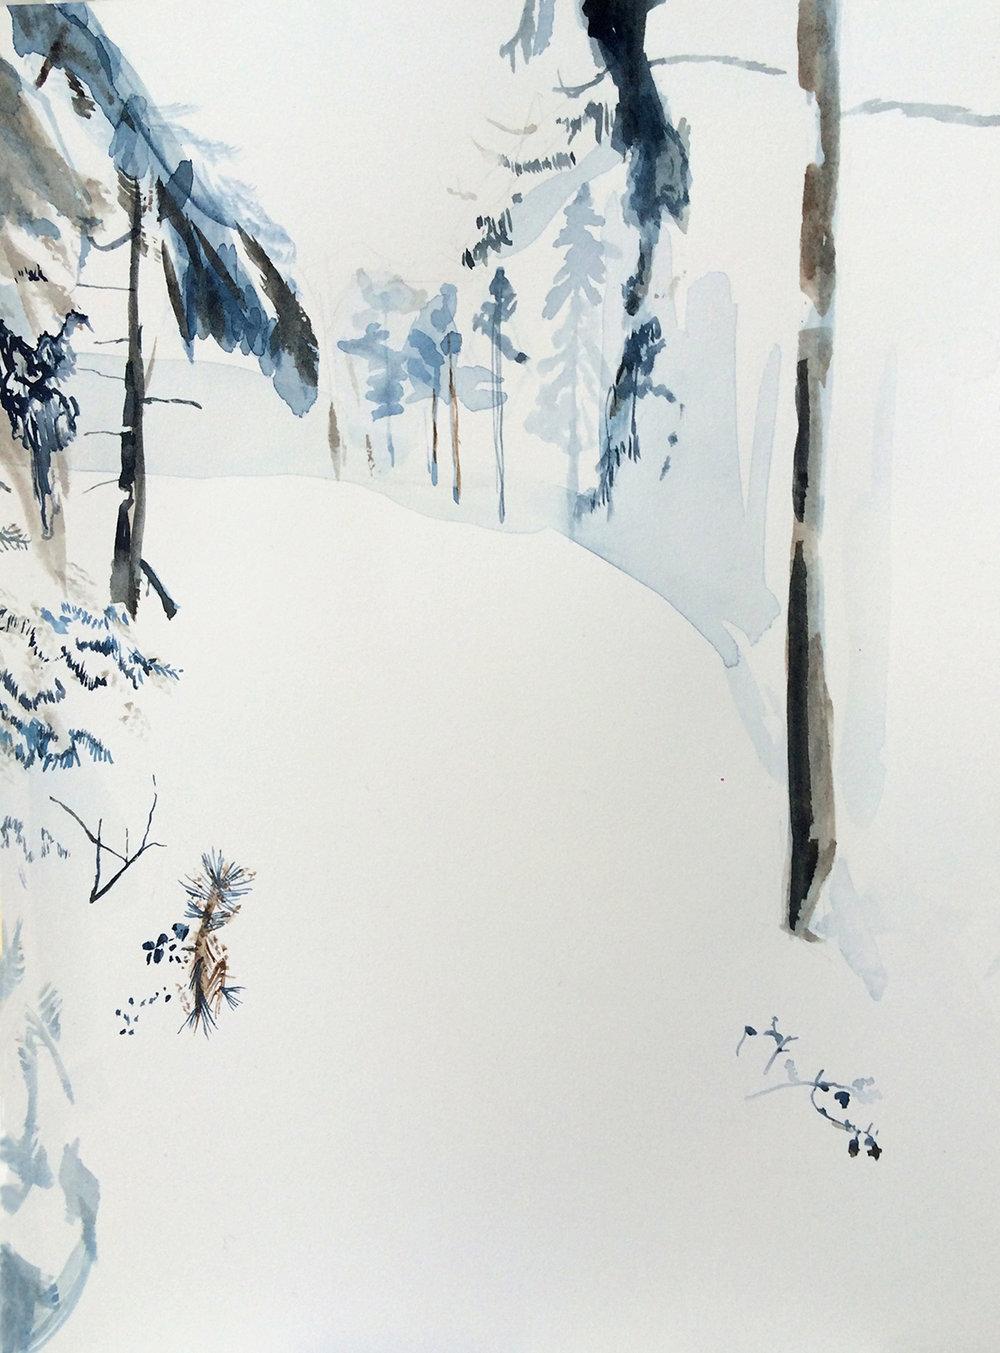 Caldera Snow Ski,  SOLD